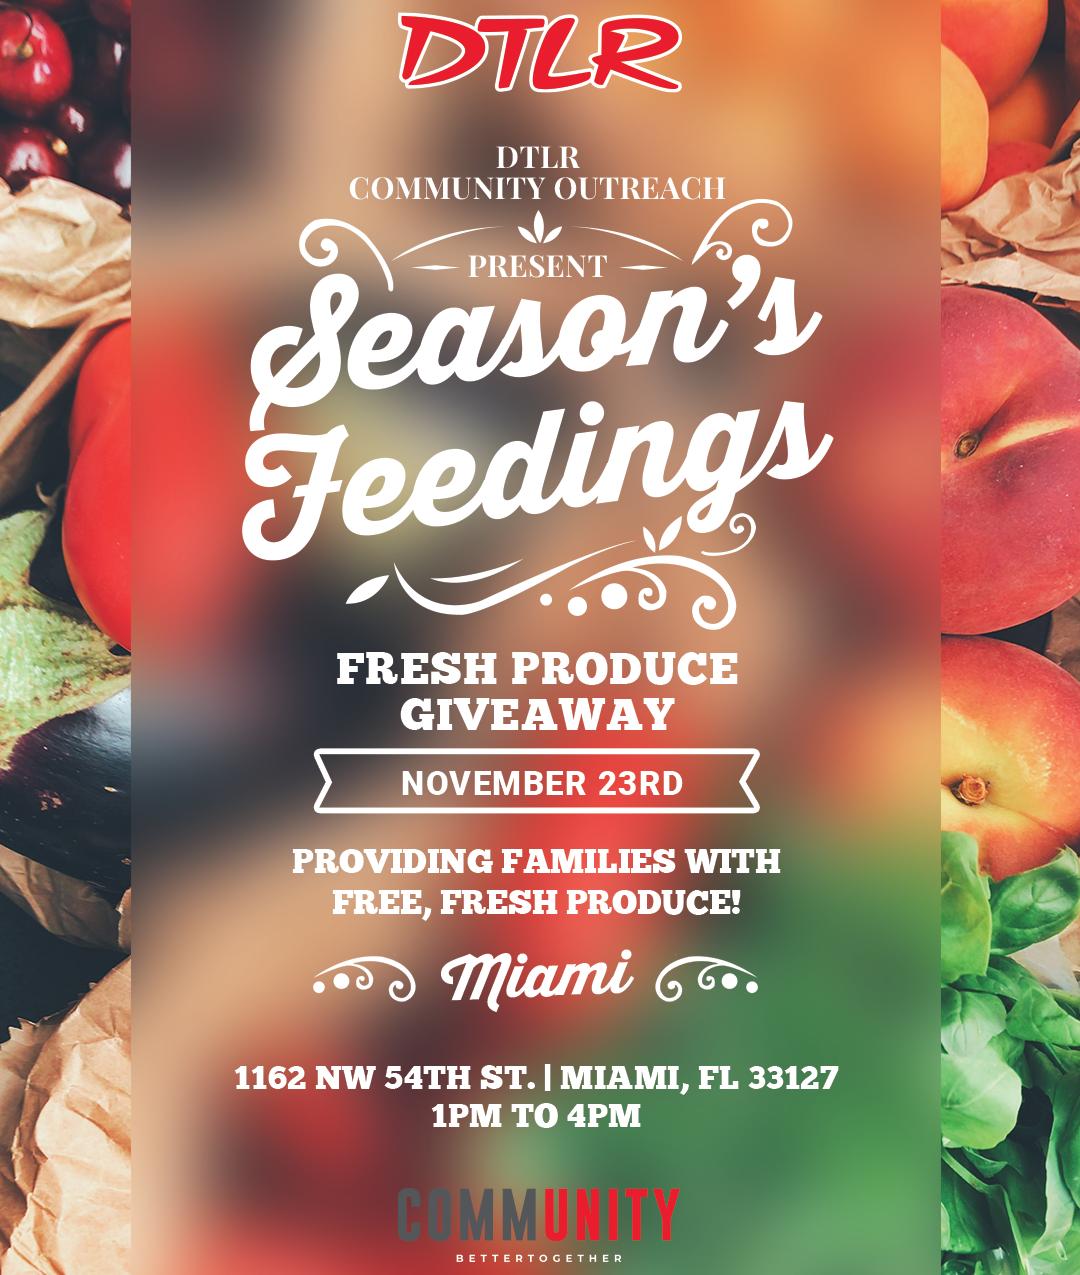 Food Drive Flyer - IG Post - Miami